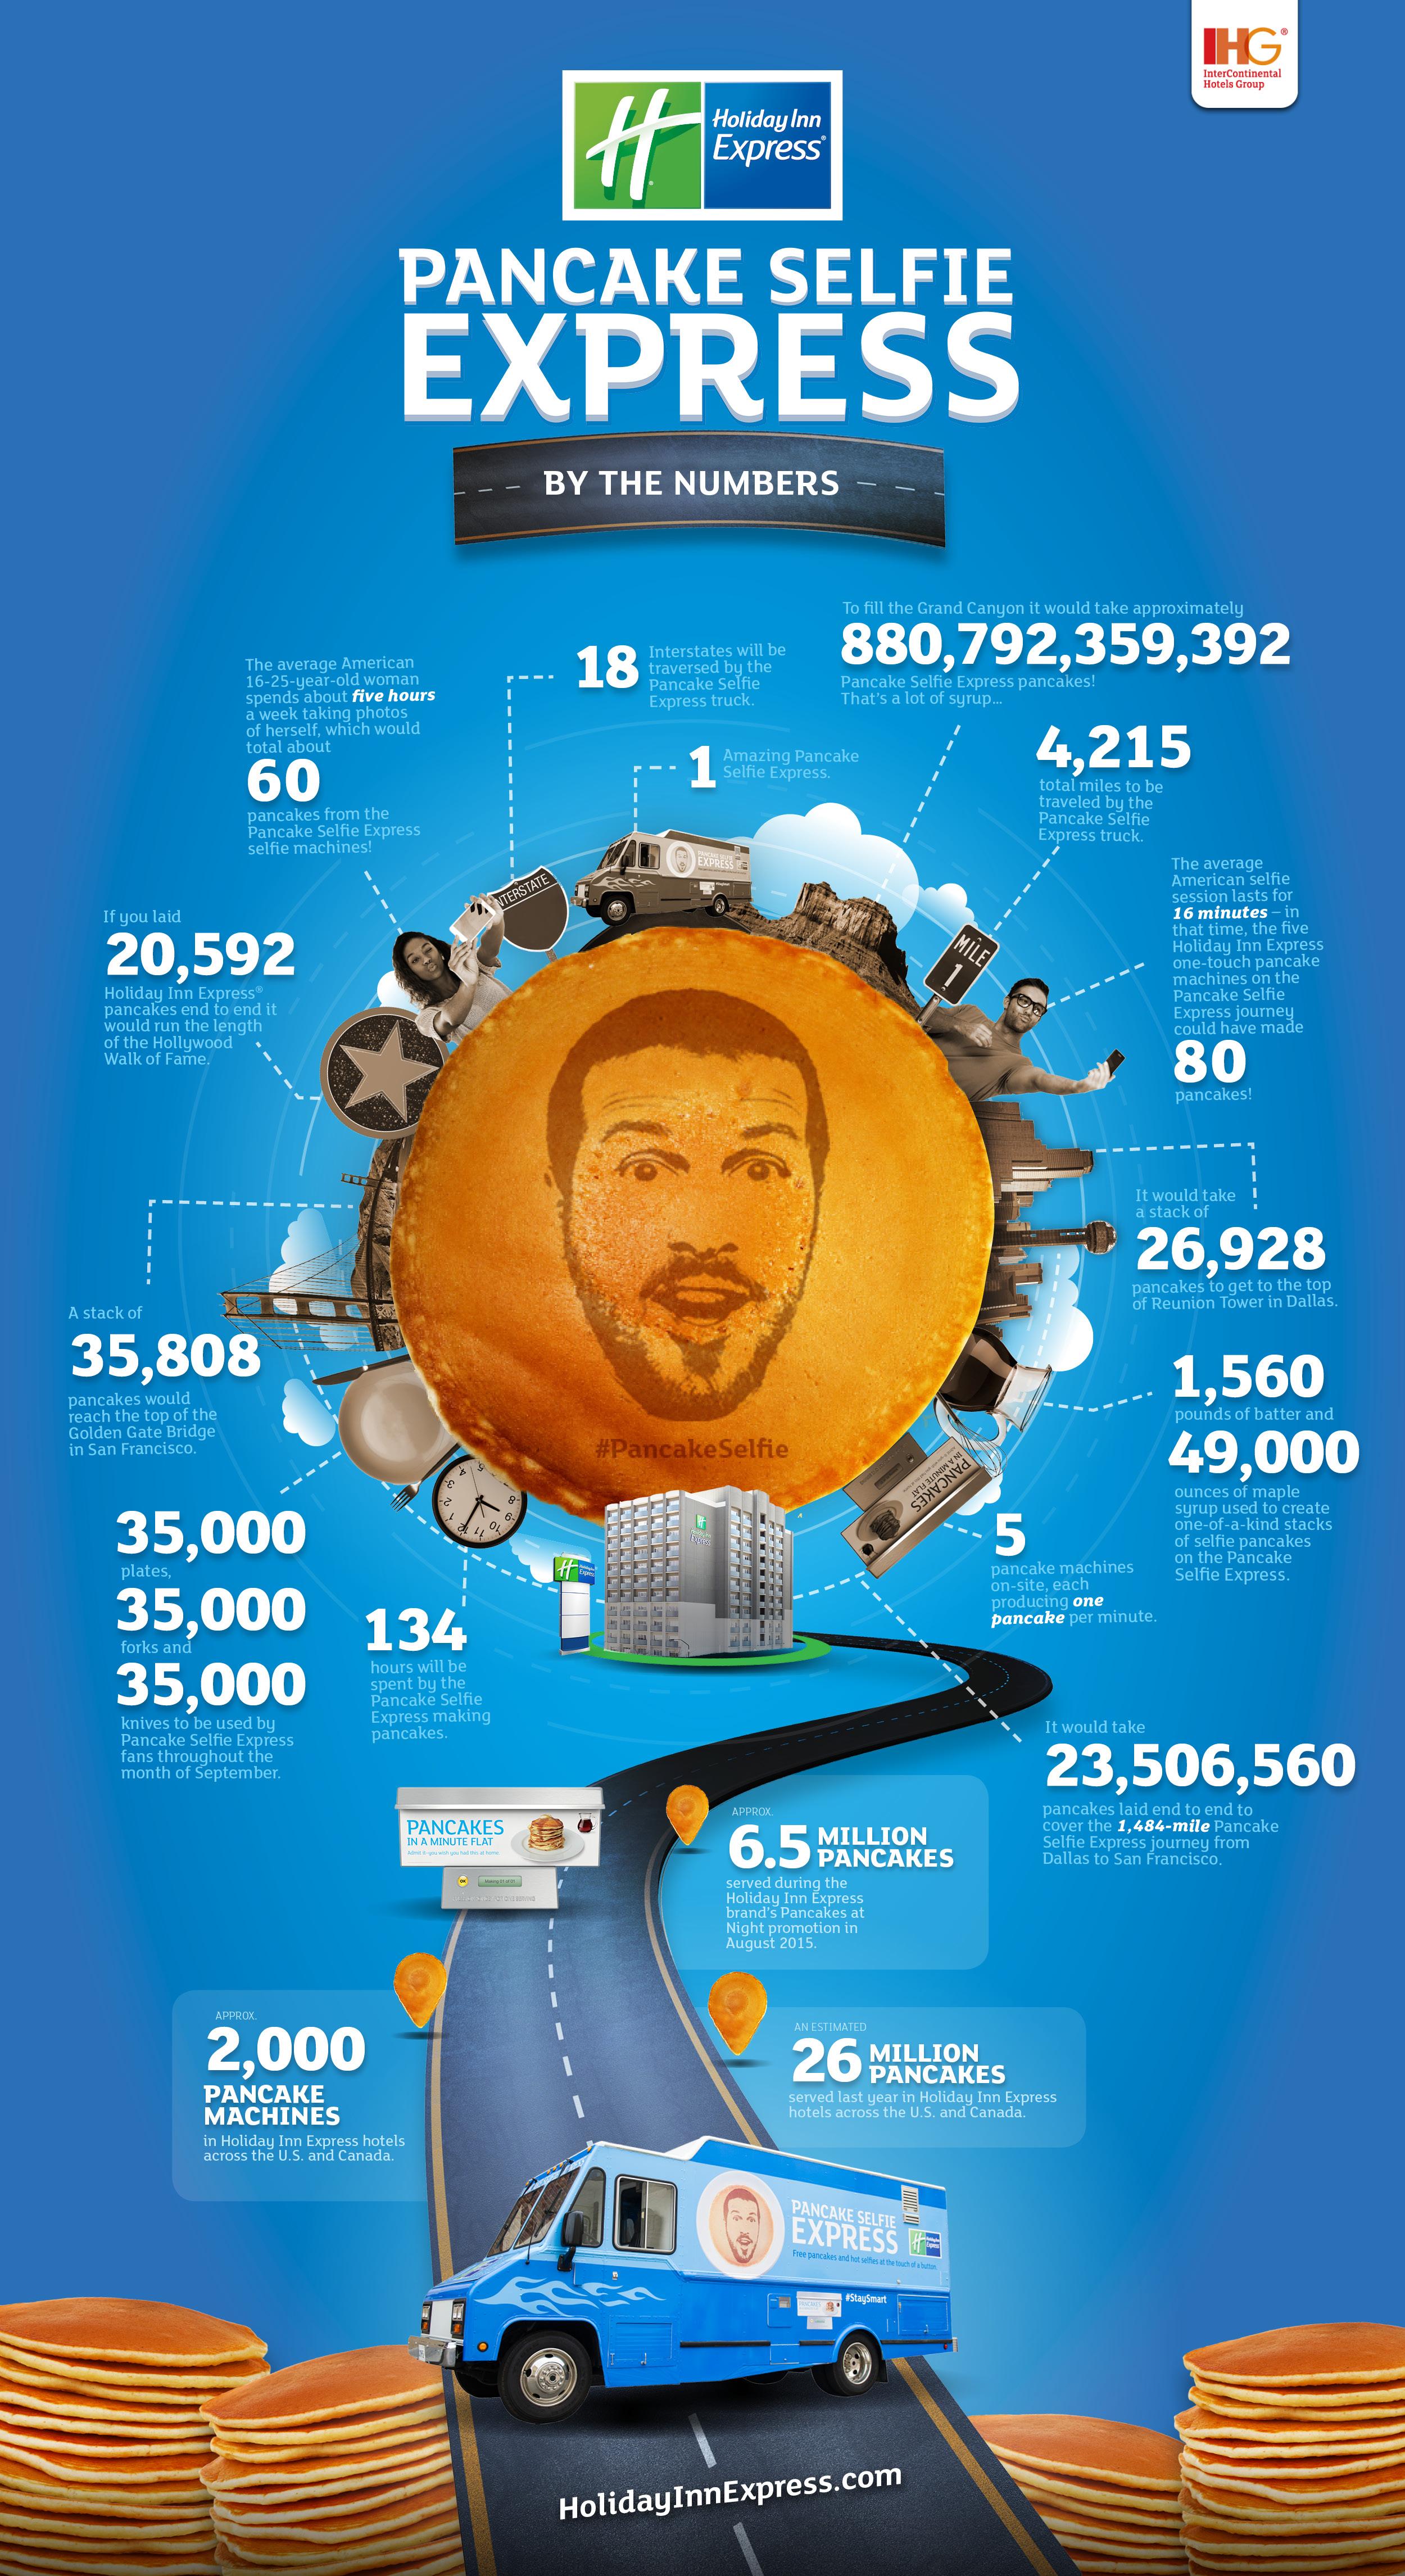 HIEX_pancake-selfie-express_Infographic